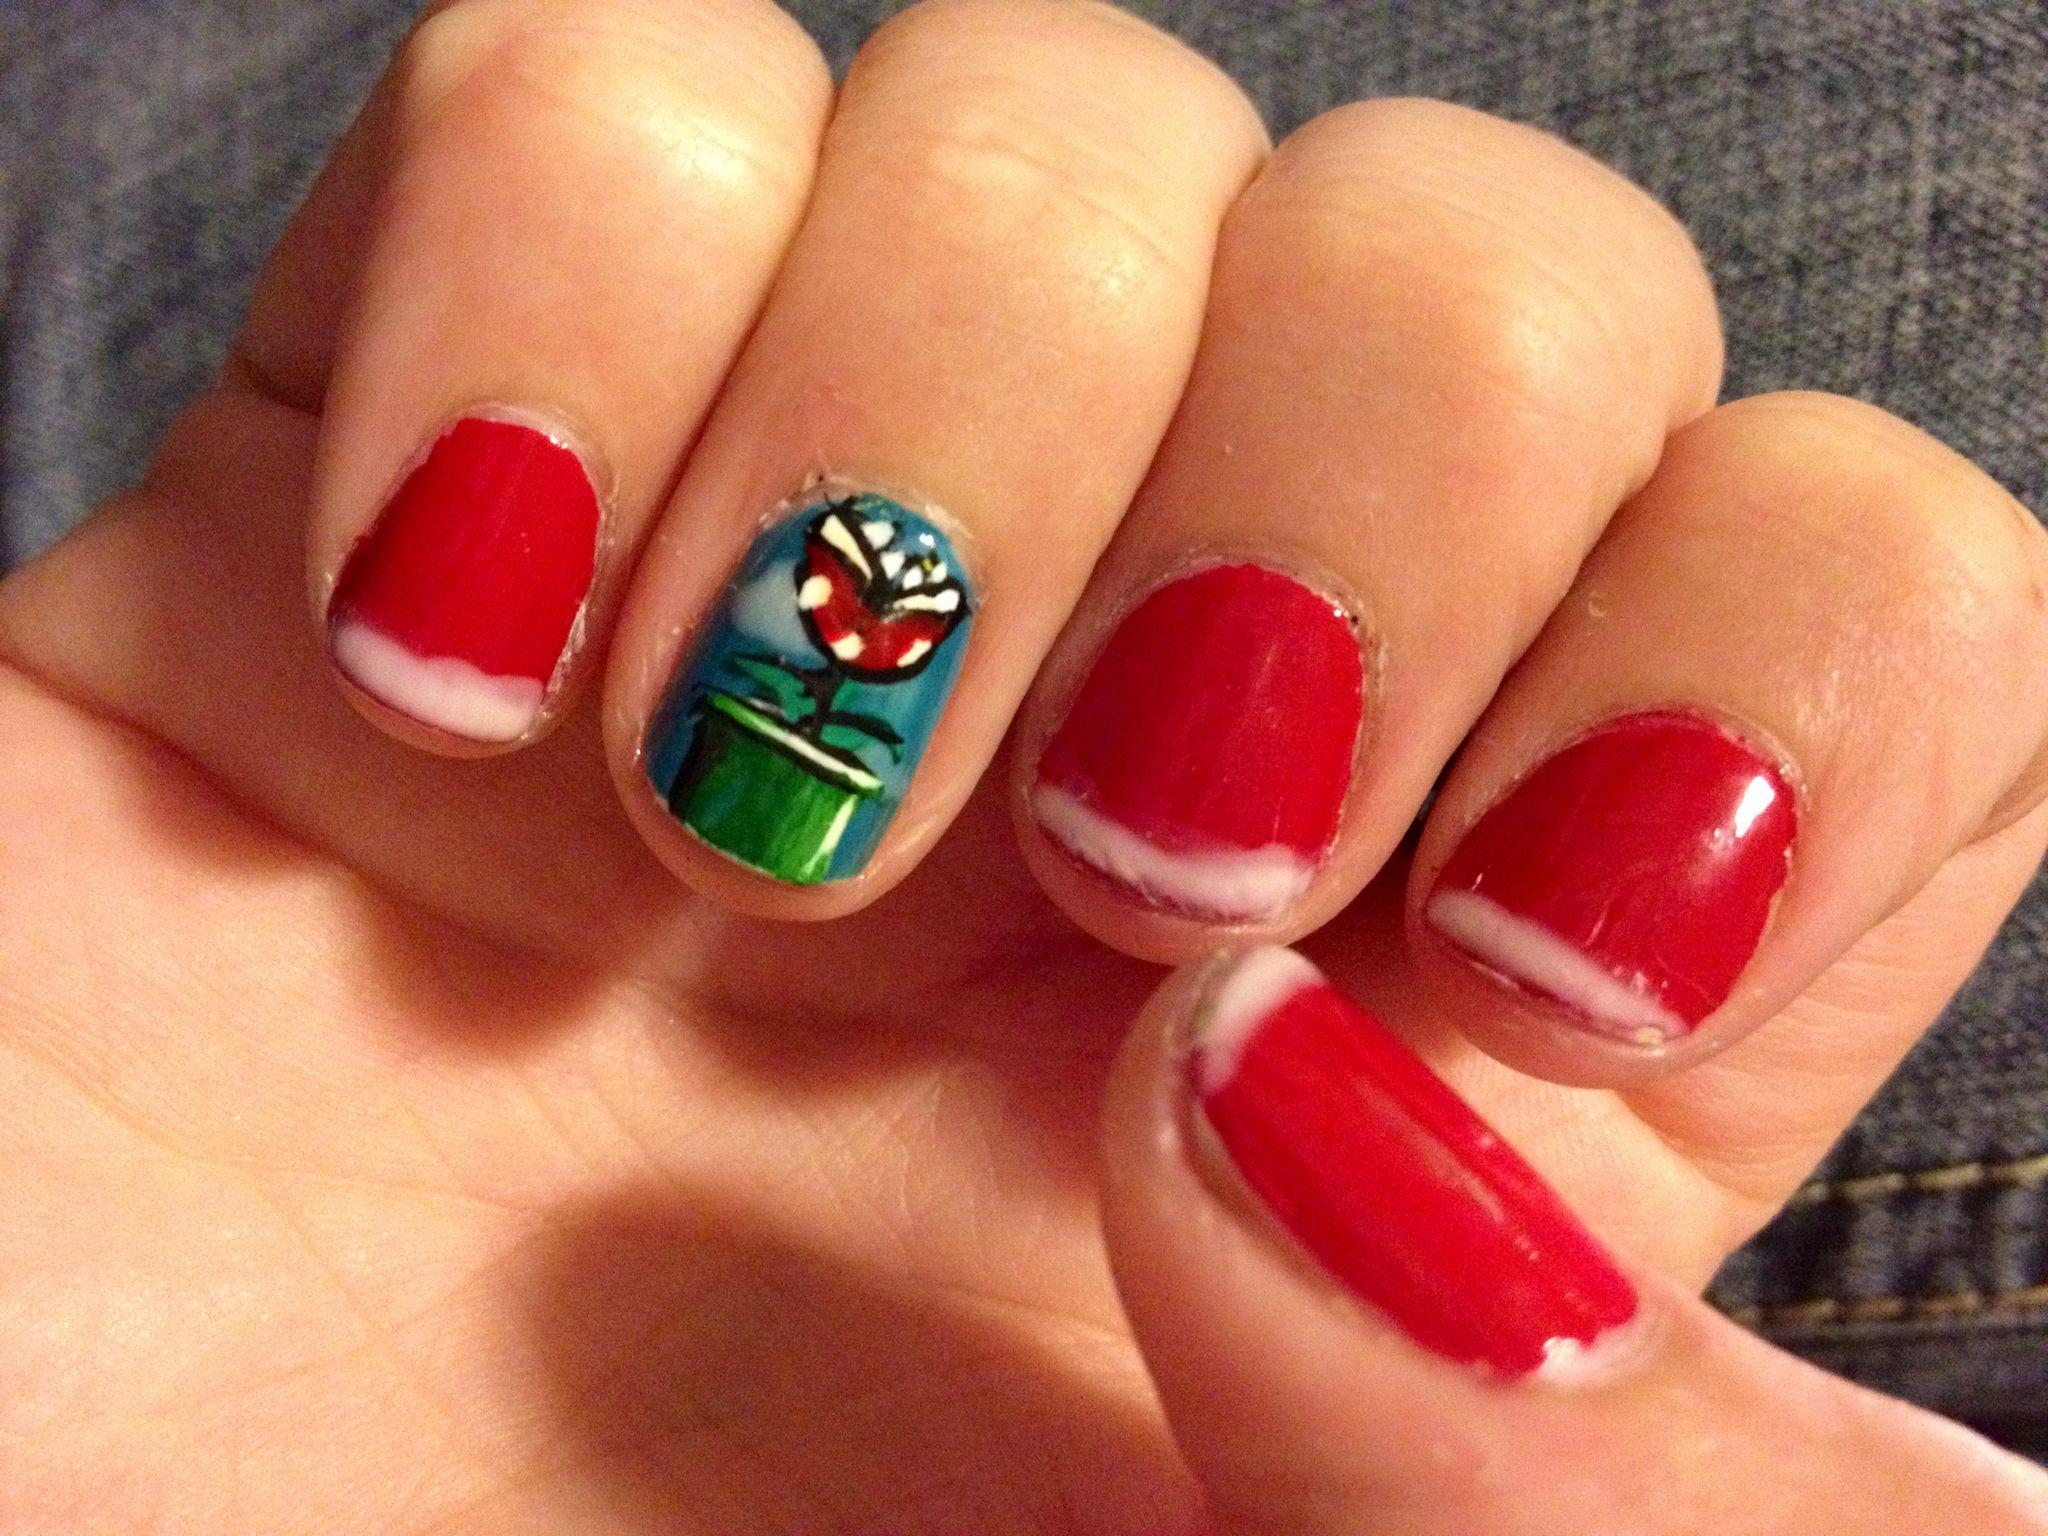 Mario Bro Piranha Plant Nerd Nails | Nails | Pinterest | Bro, Nail ...